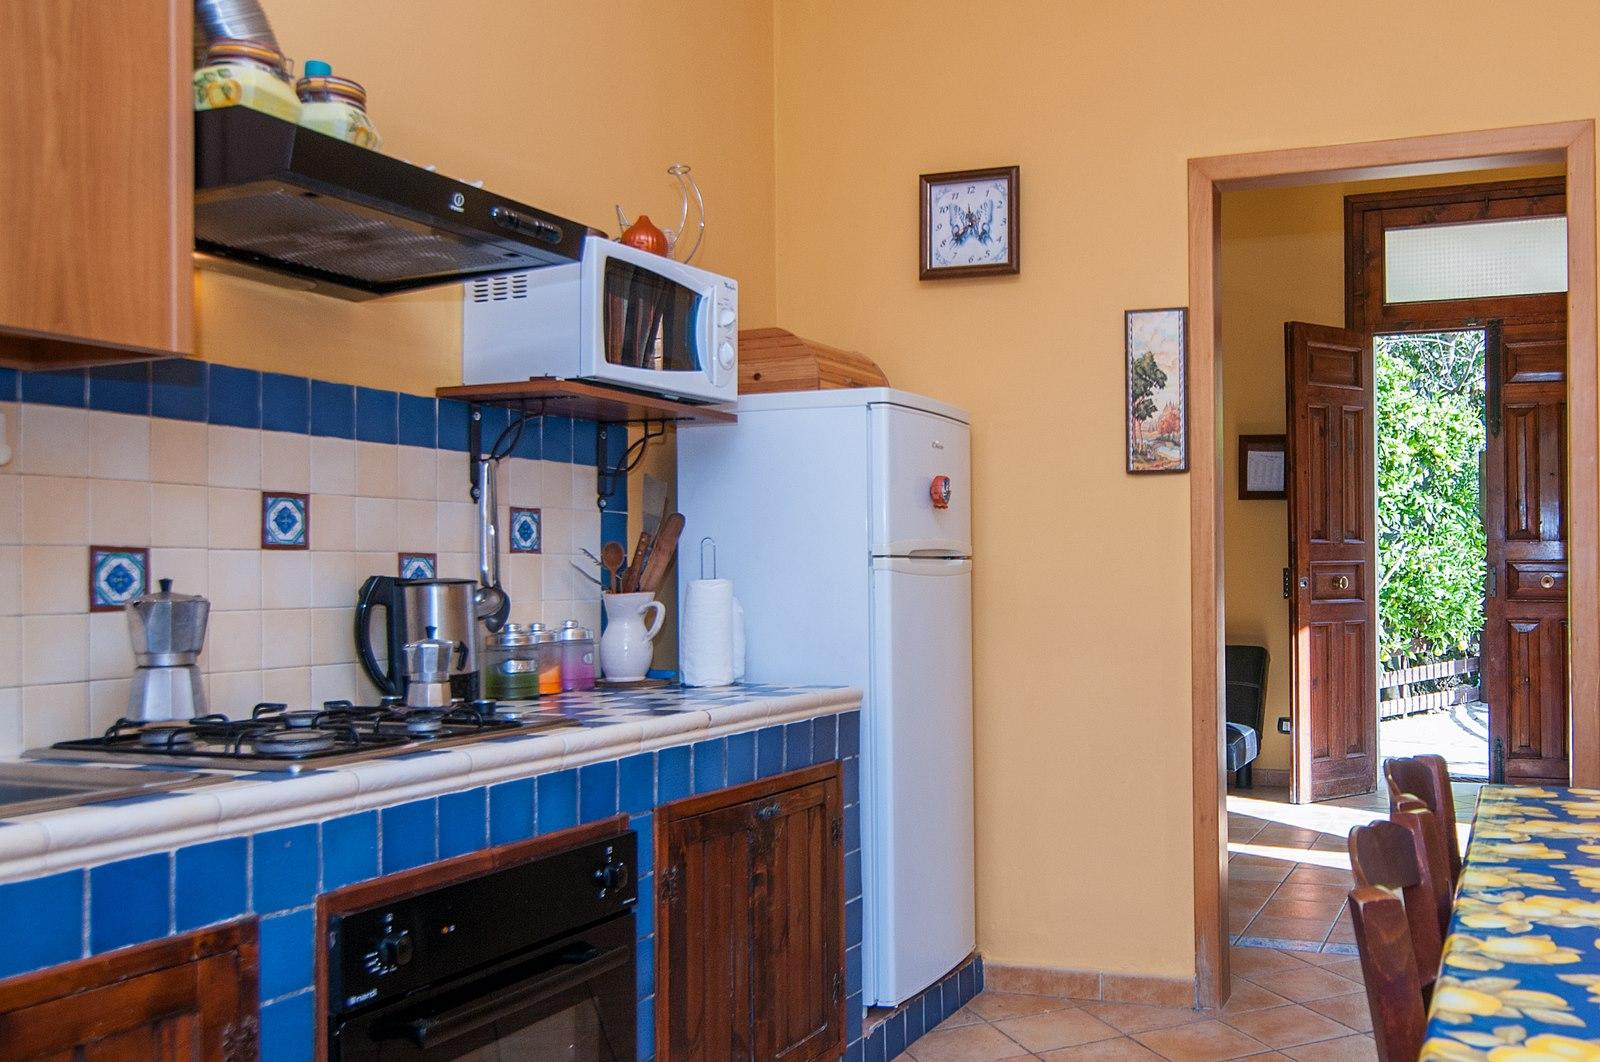 Maison de vacances Villetta a Lido (1540086), Lido di Noto, Siracusa, Sicile, Italie, image 24